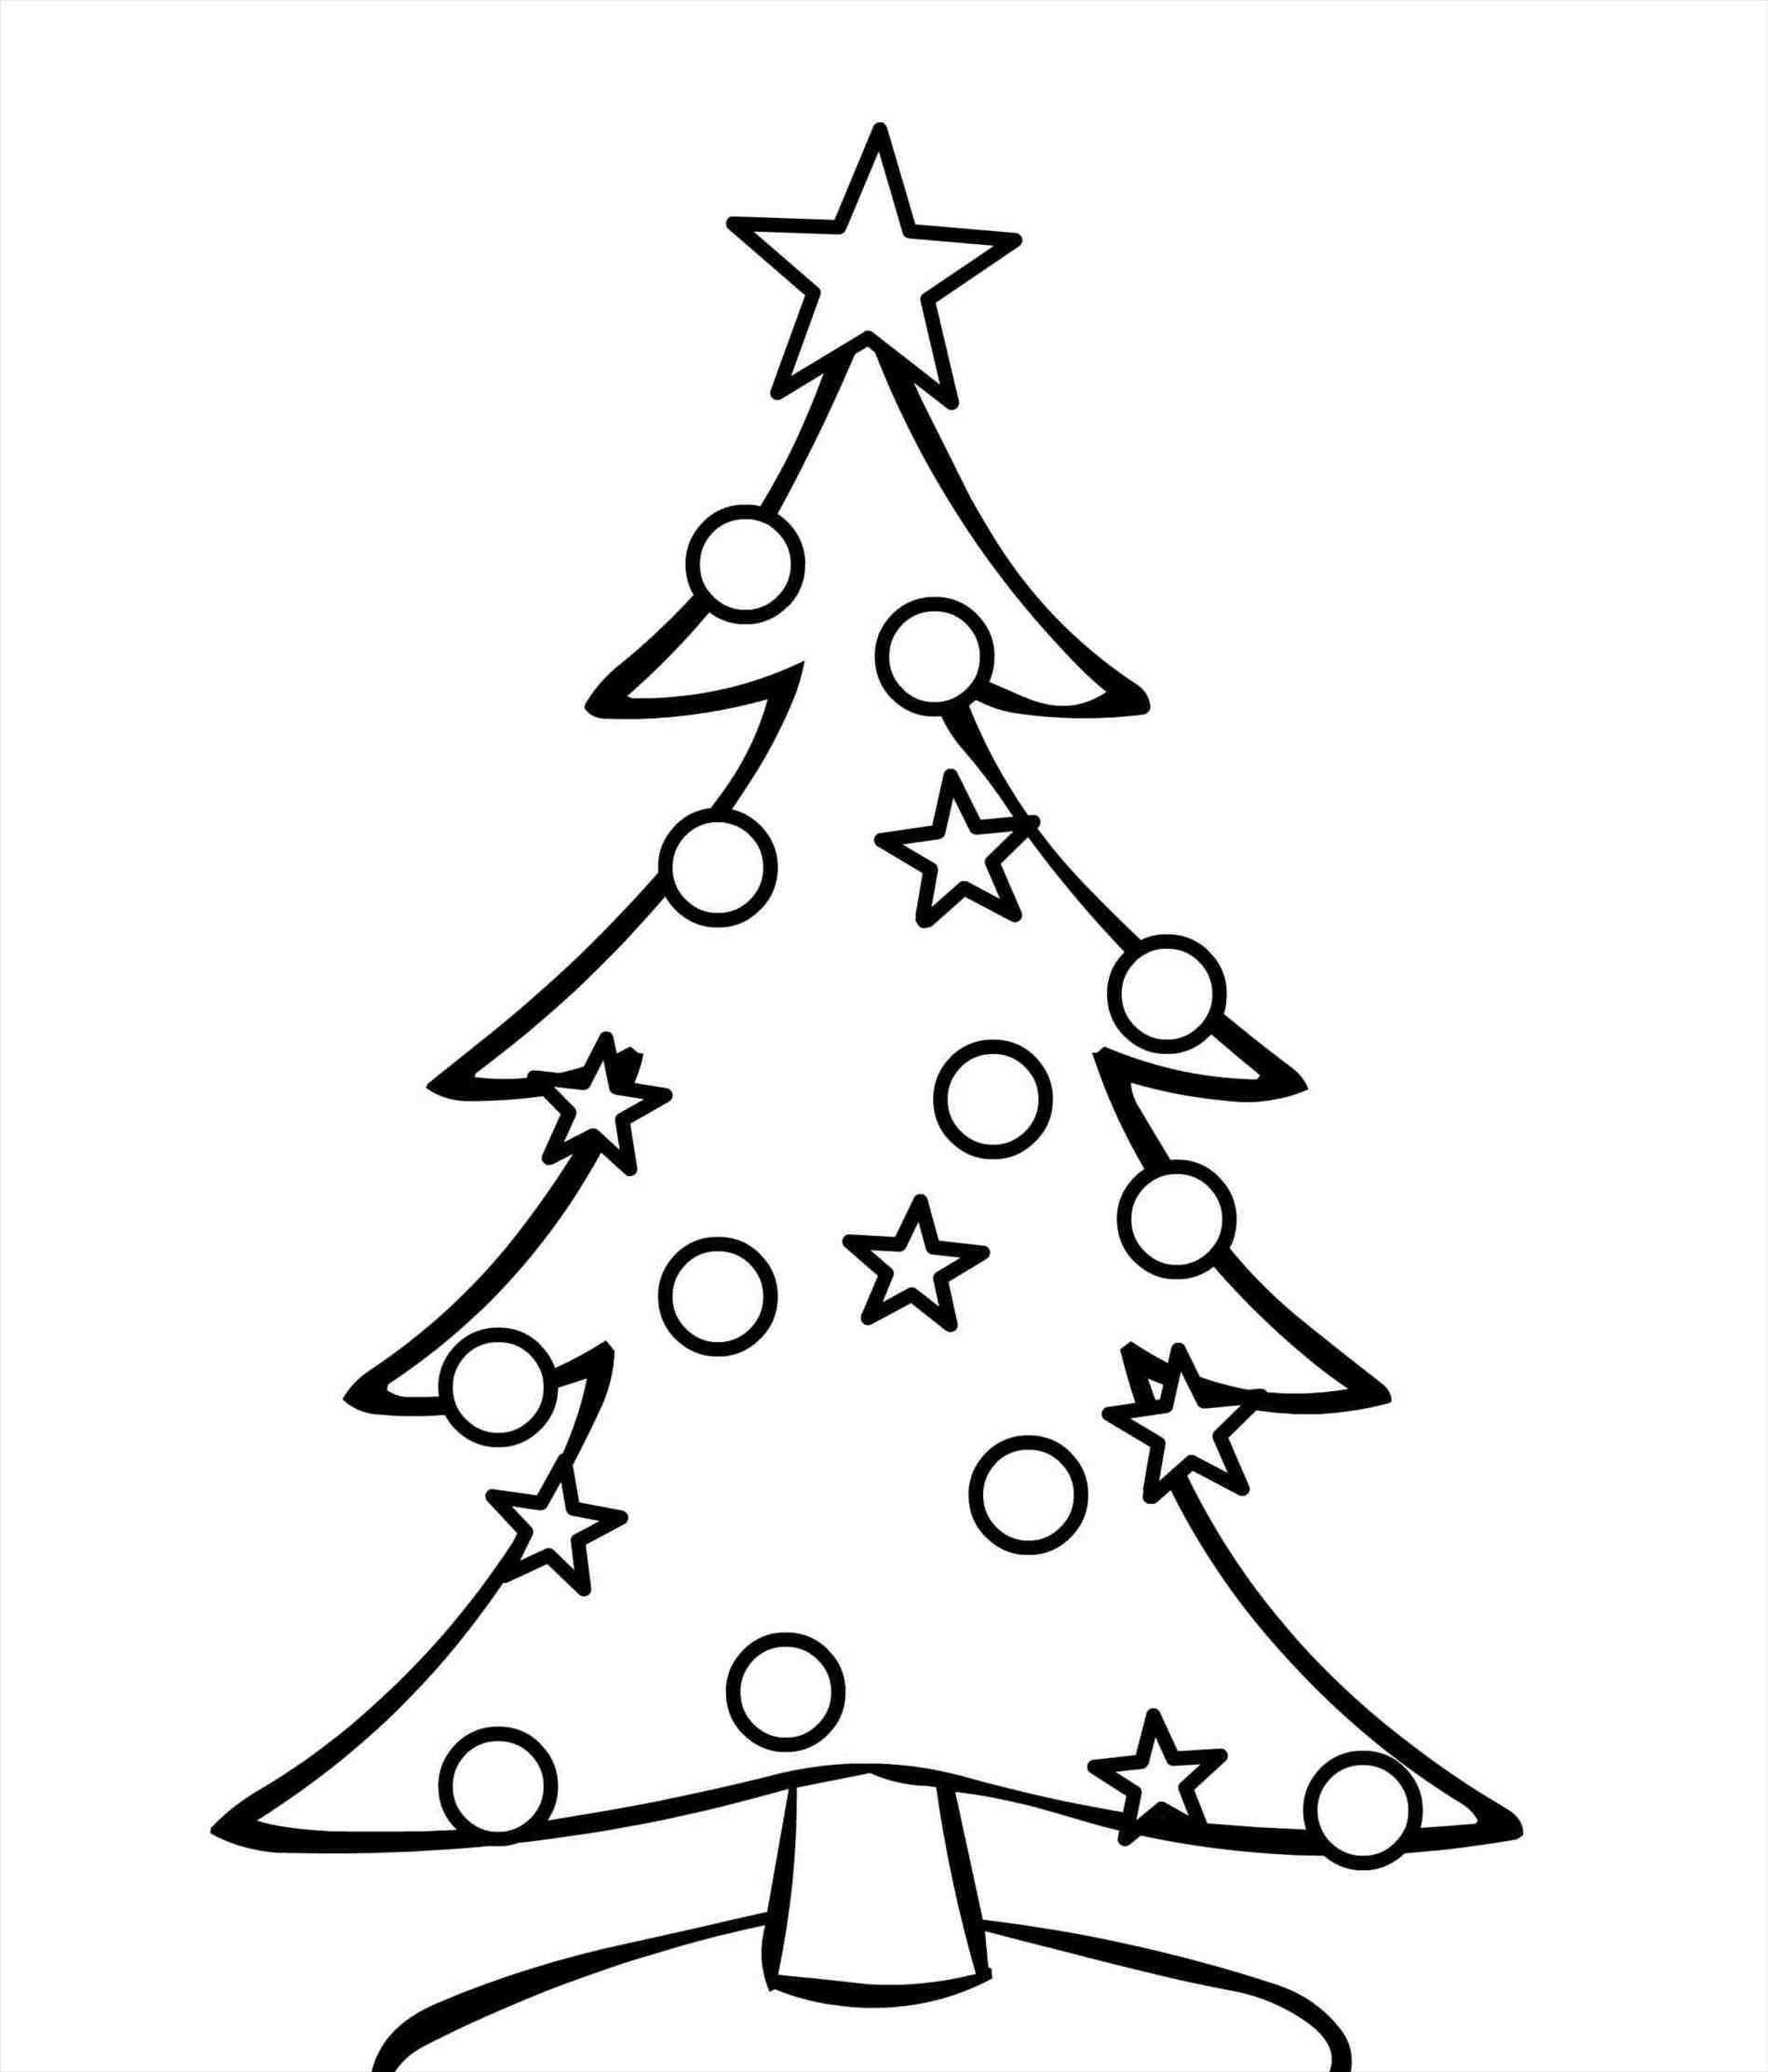 33a884f8c3f189e6b94a43caf1a125c9 » Christmas Tree Coloring Picture